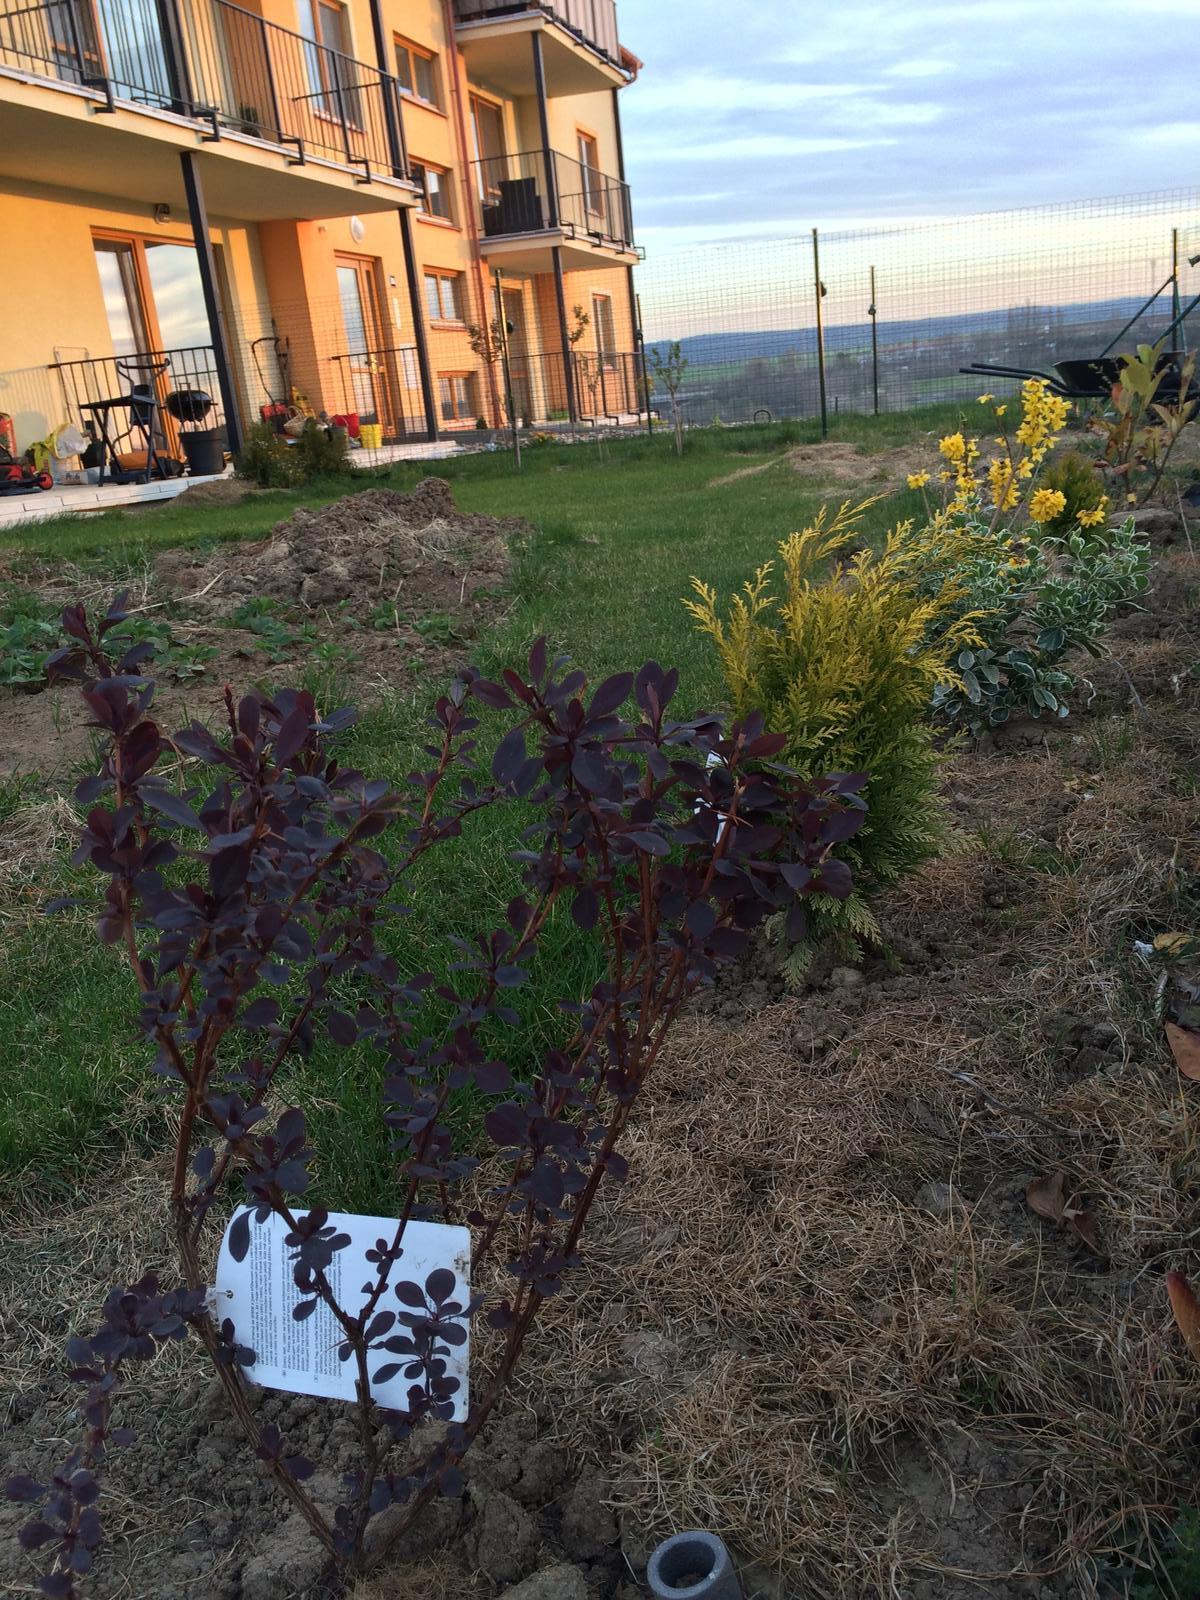 Zahradka nasa 2015 - z toho bude jednou zivy plot :)